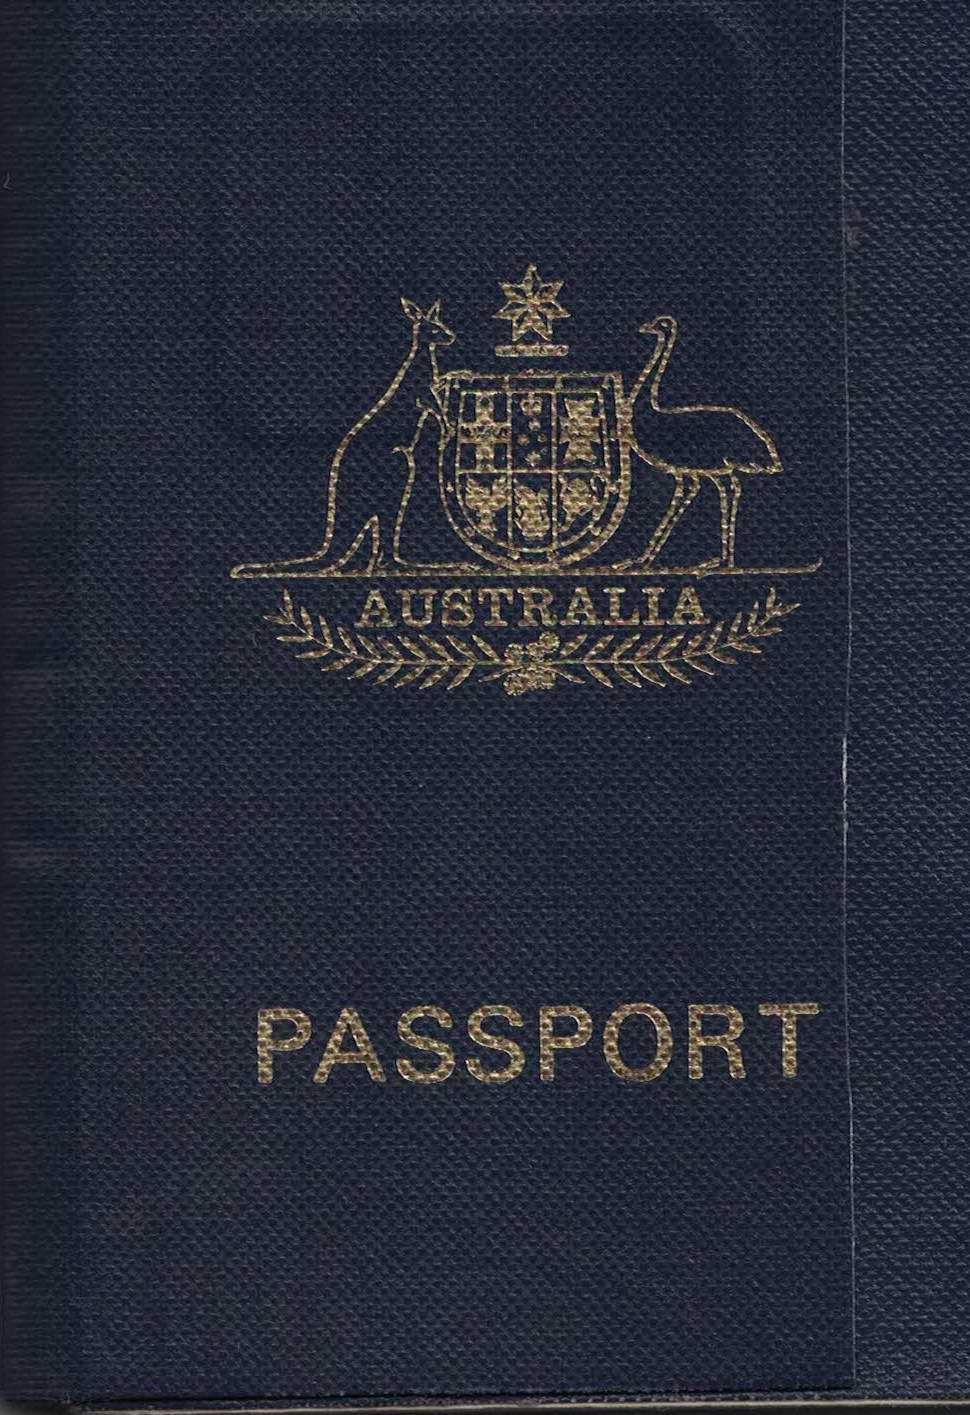 Oz passport